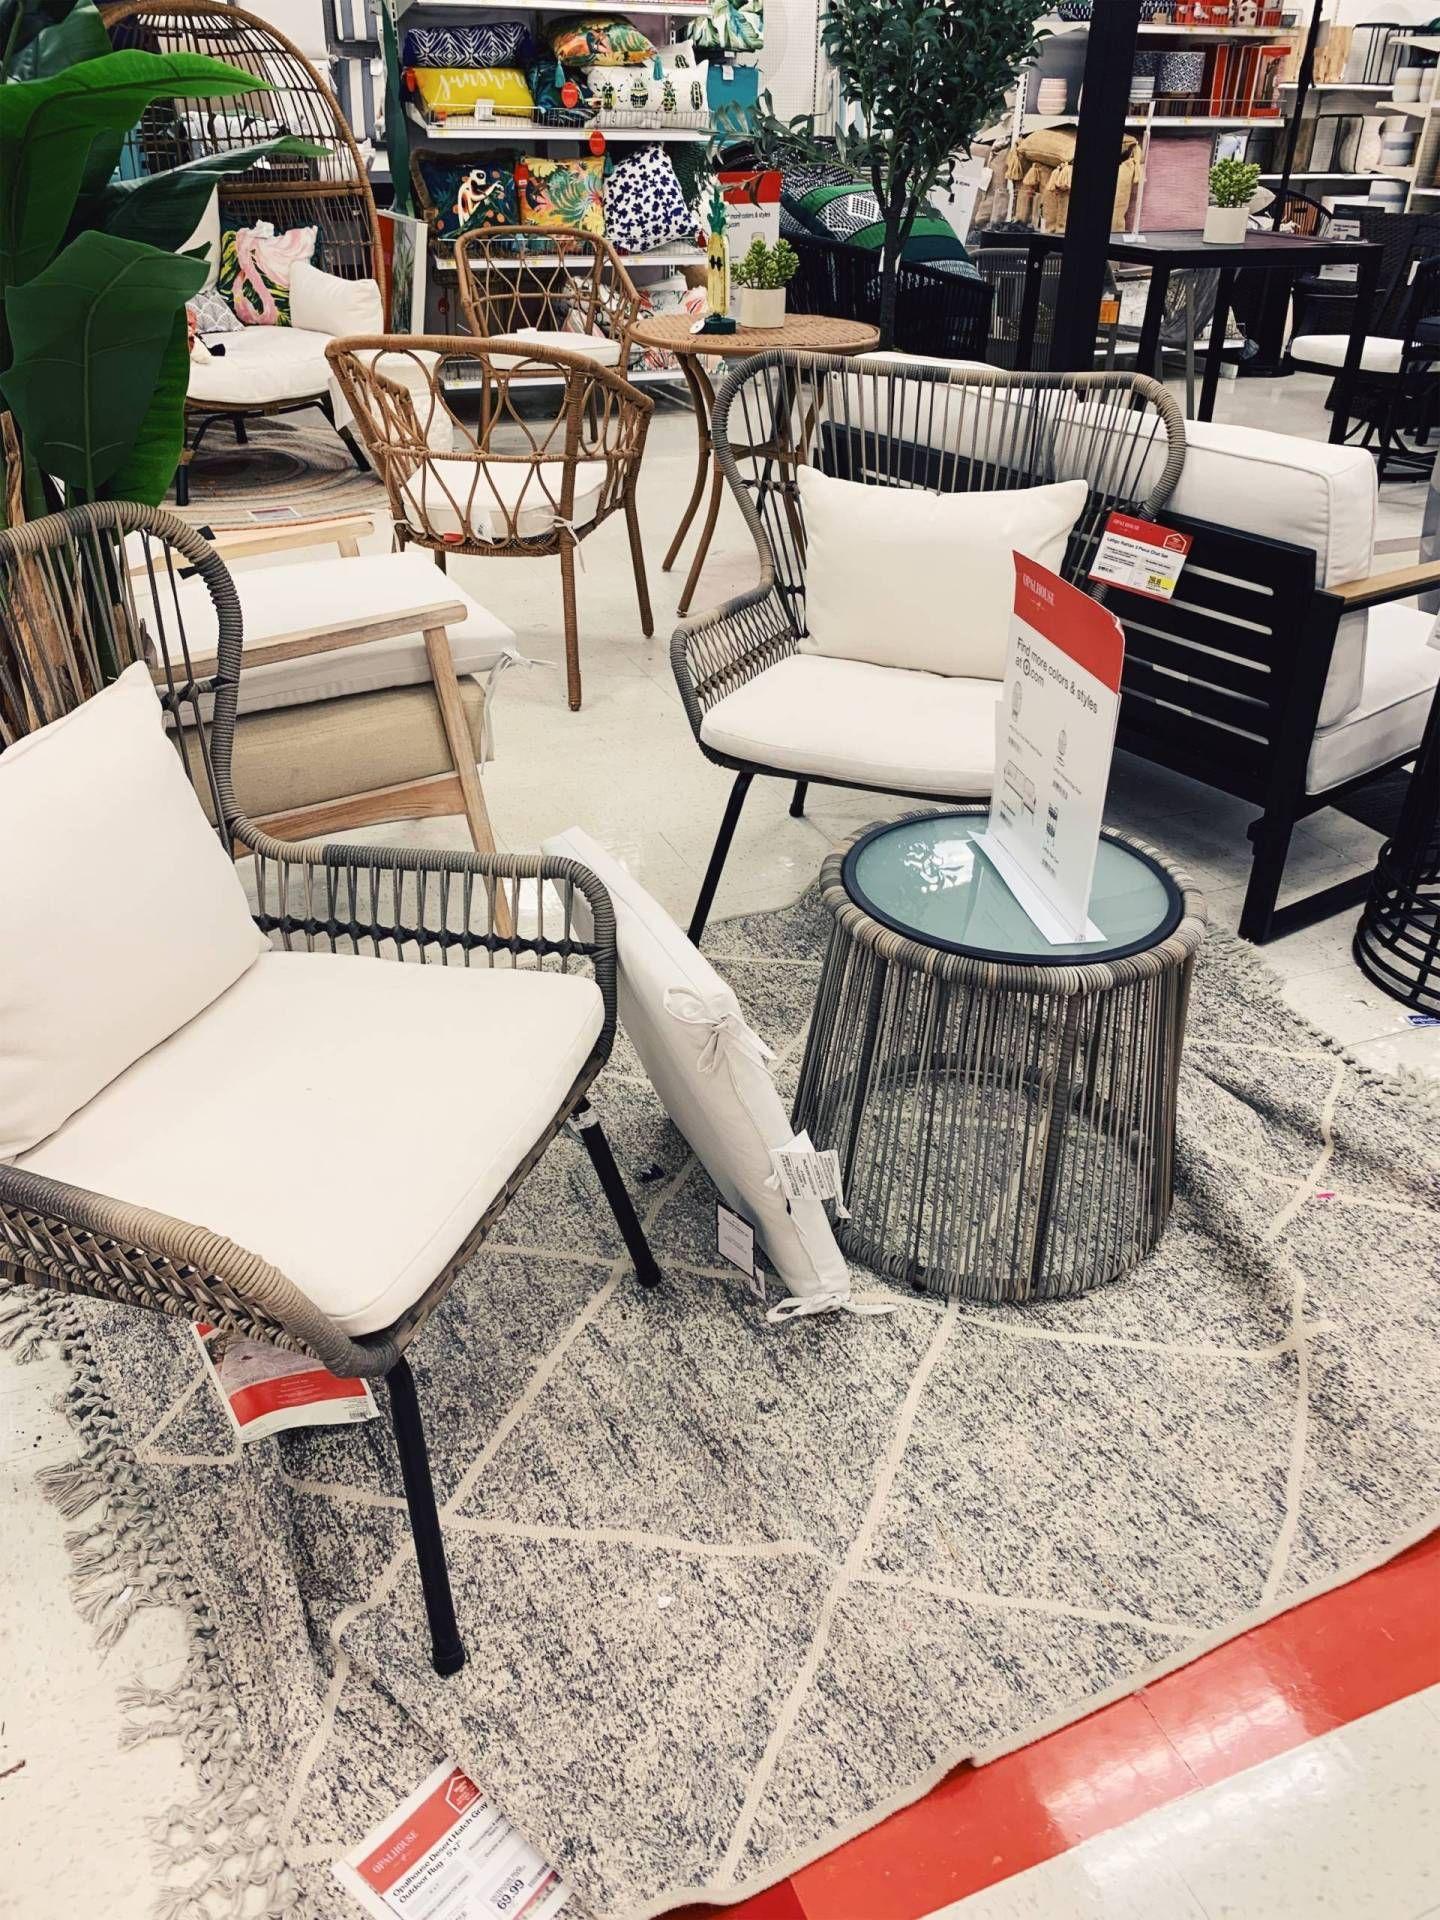 Target Outdoor Furniture Favorites The Pink Dream Target Outdoor Furniture Outdoor Furniture Affordable Outdoor Furniture